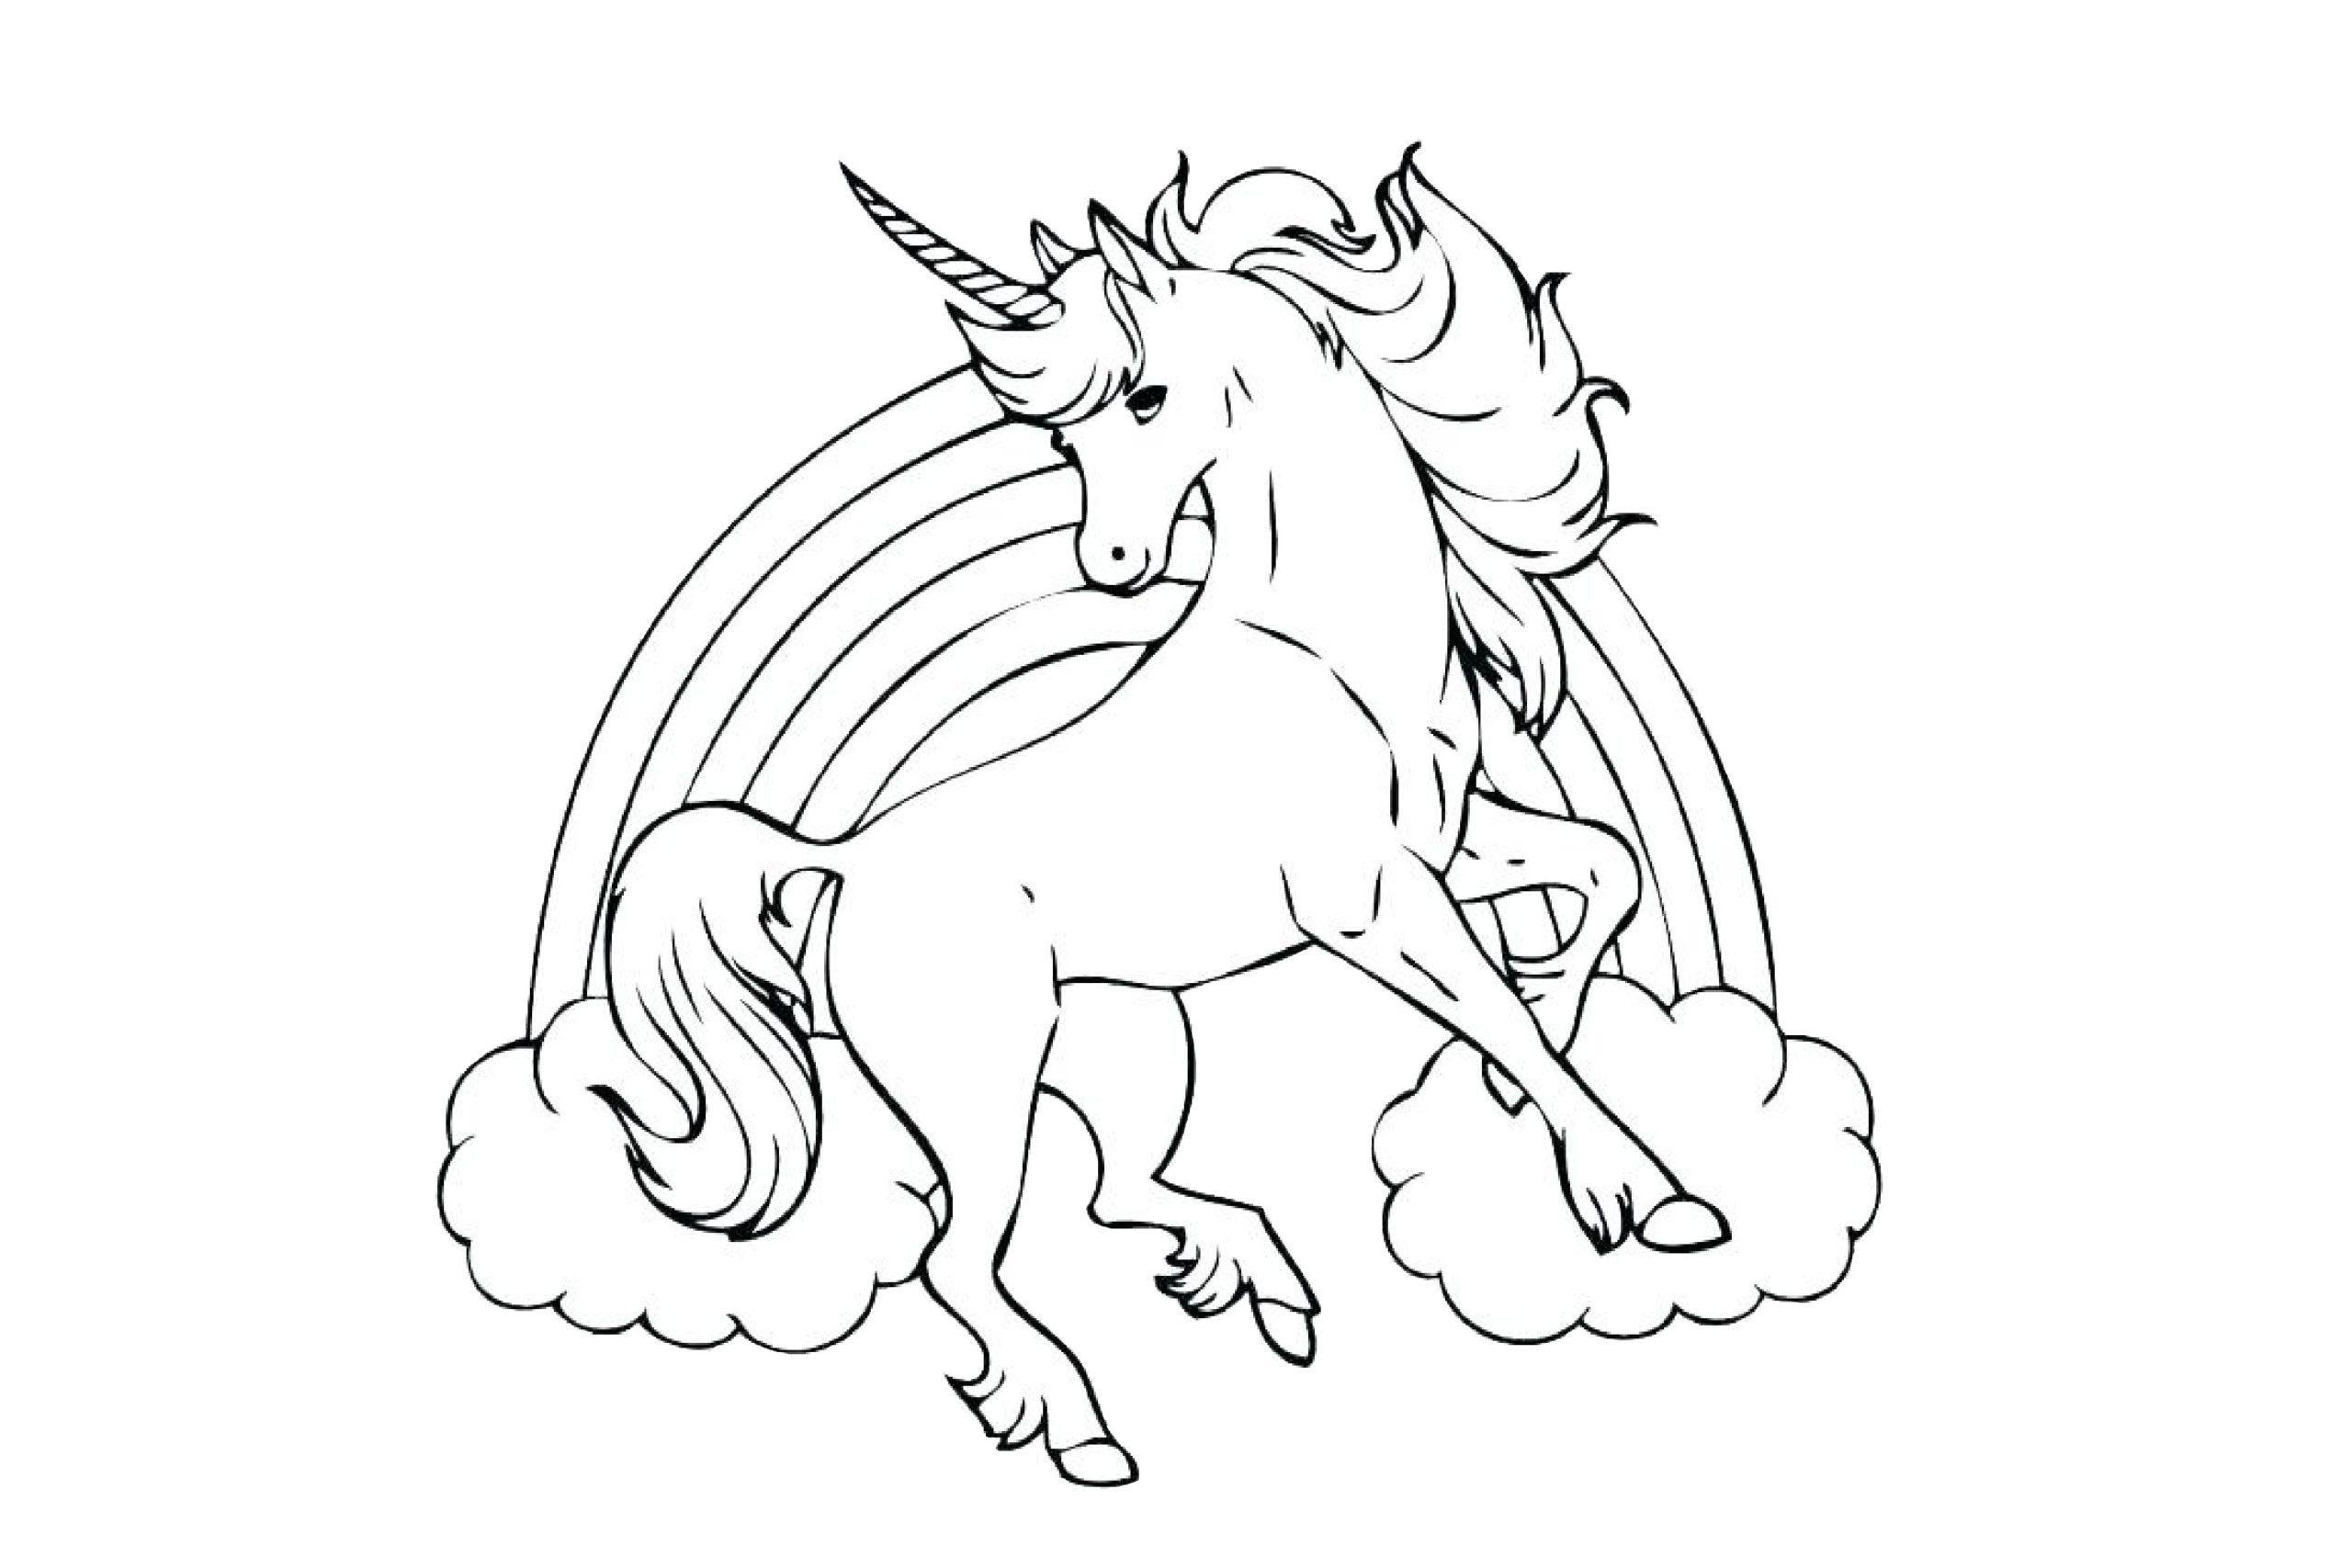 38 Printable Coloring Unicorn Pictures In 2020 Unicorn Coloring Pages Rainbow Pages Star Coloring Pages